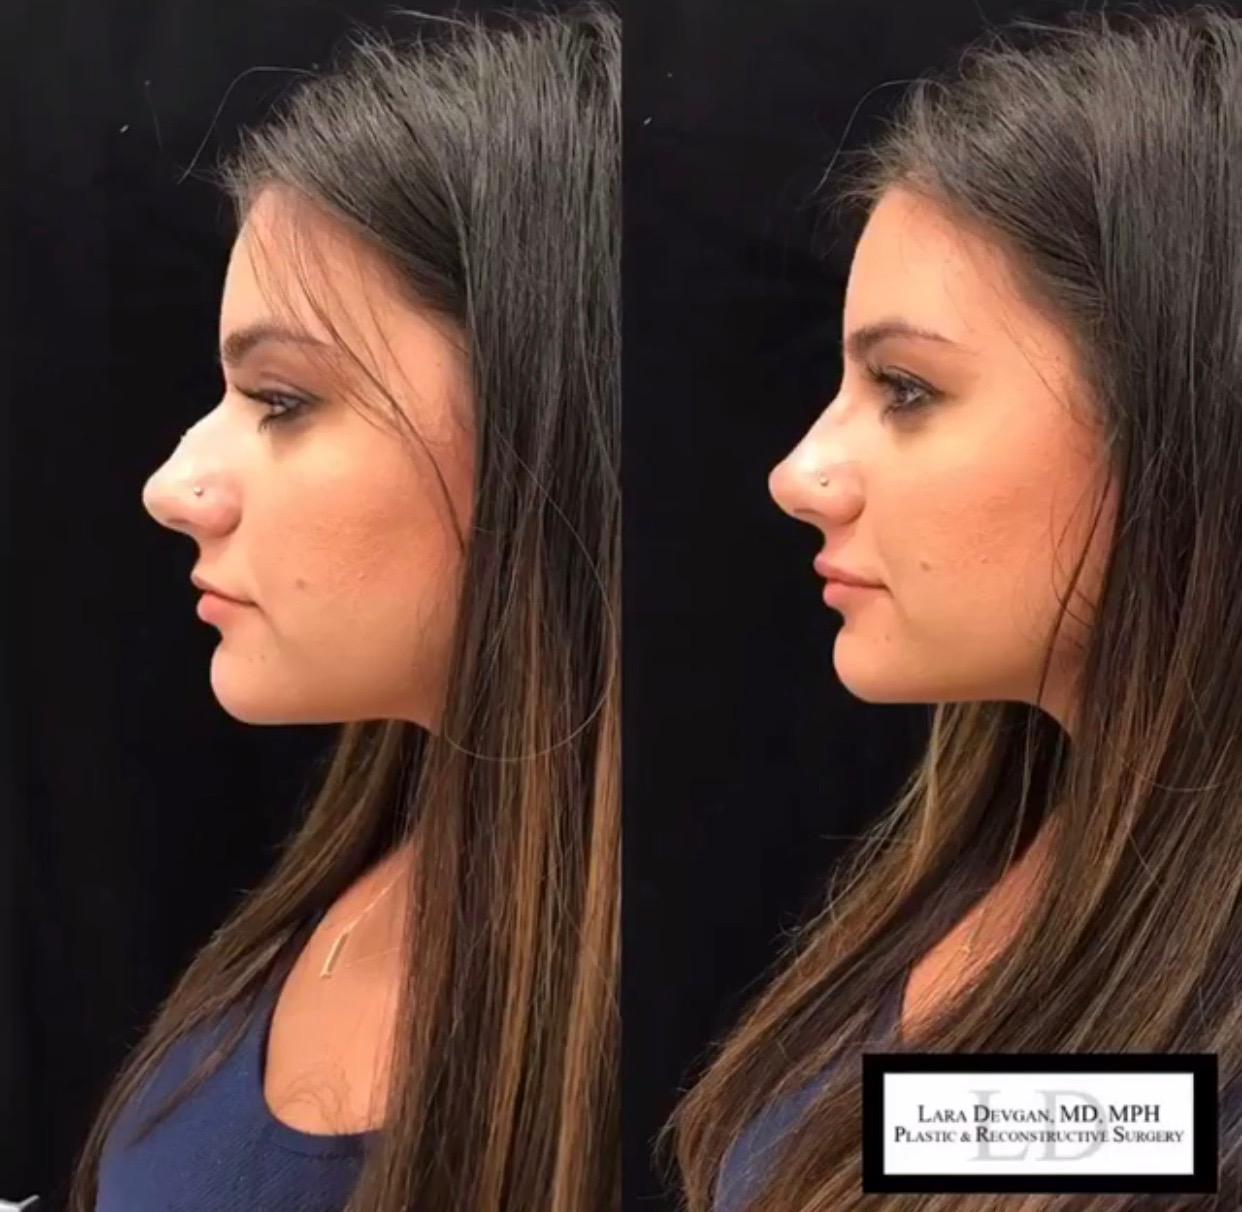 Striking result achieved through a non-surgical rhinoplasty, a signature Dr. Devgan procedure.